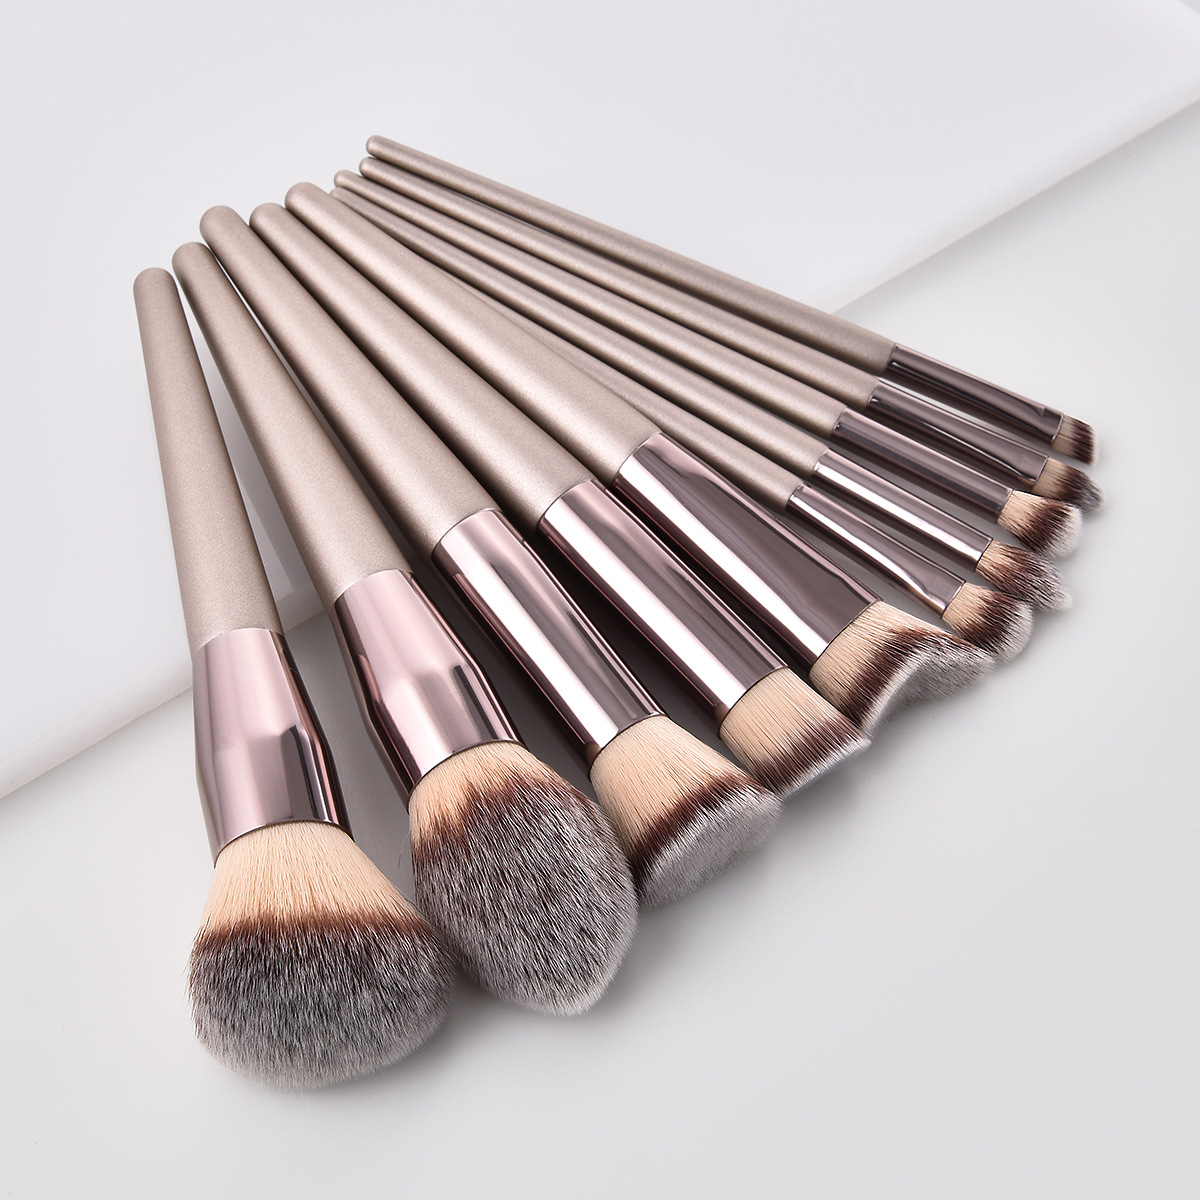 Luxury Champagne Makeup Brushes Set For Foundation Powder Blush Eyeshadow Concealer font b Make b font